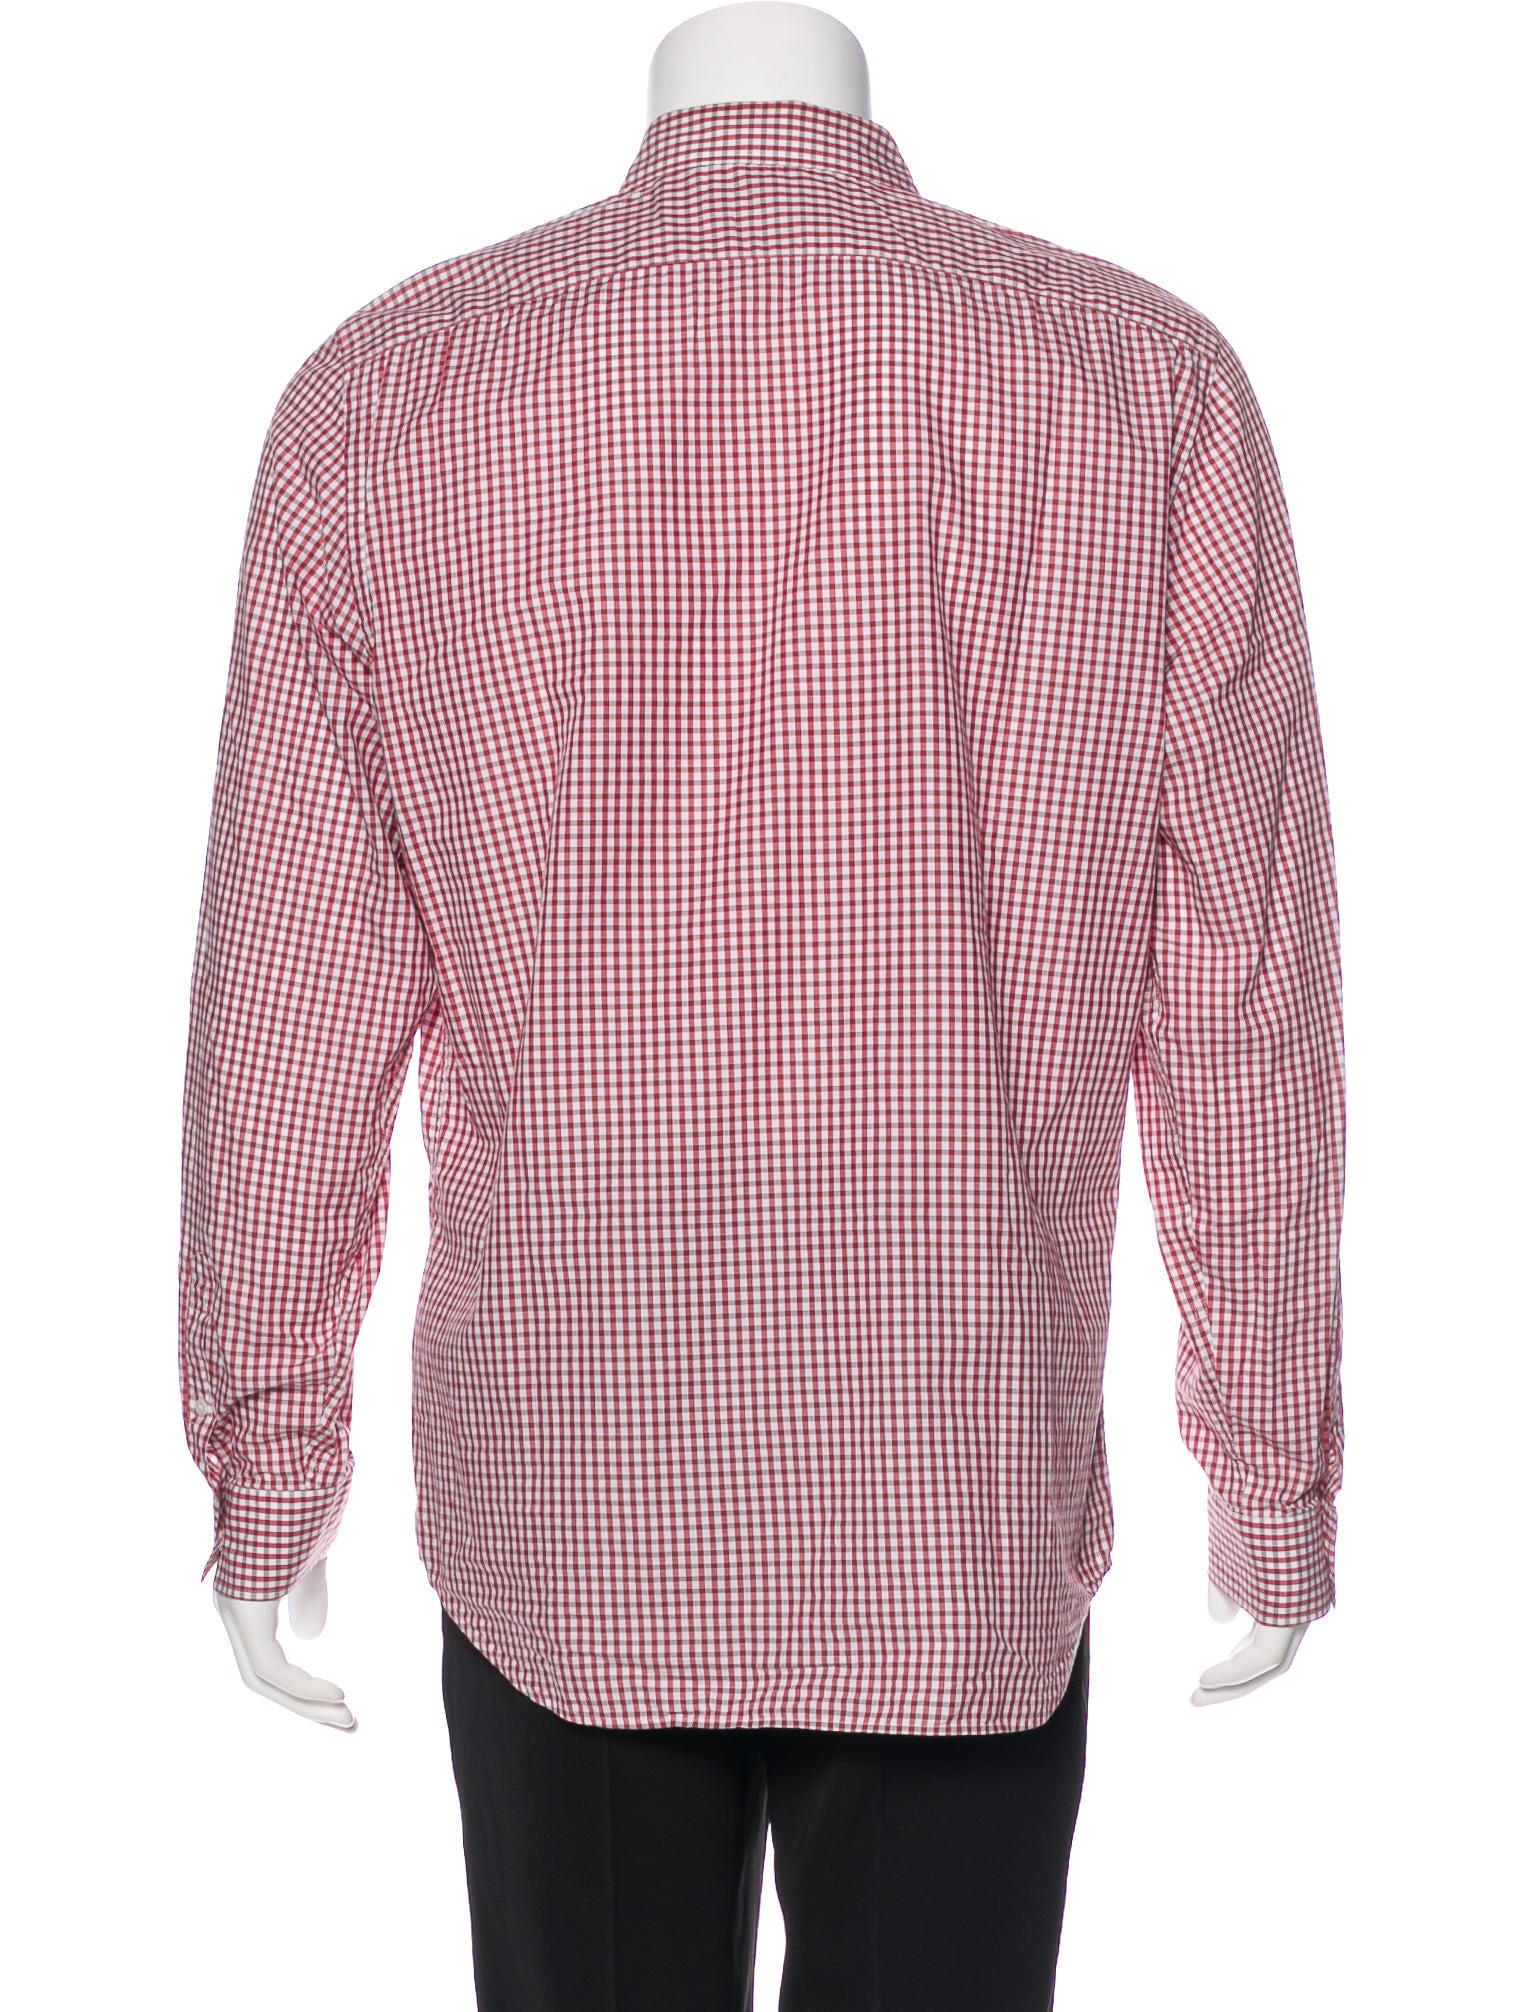 Burberry London Gingham Woven Shirt Mens Shirts